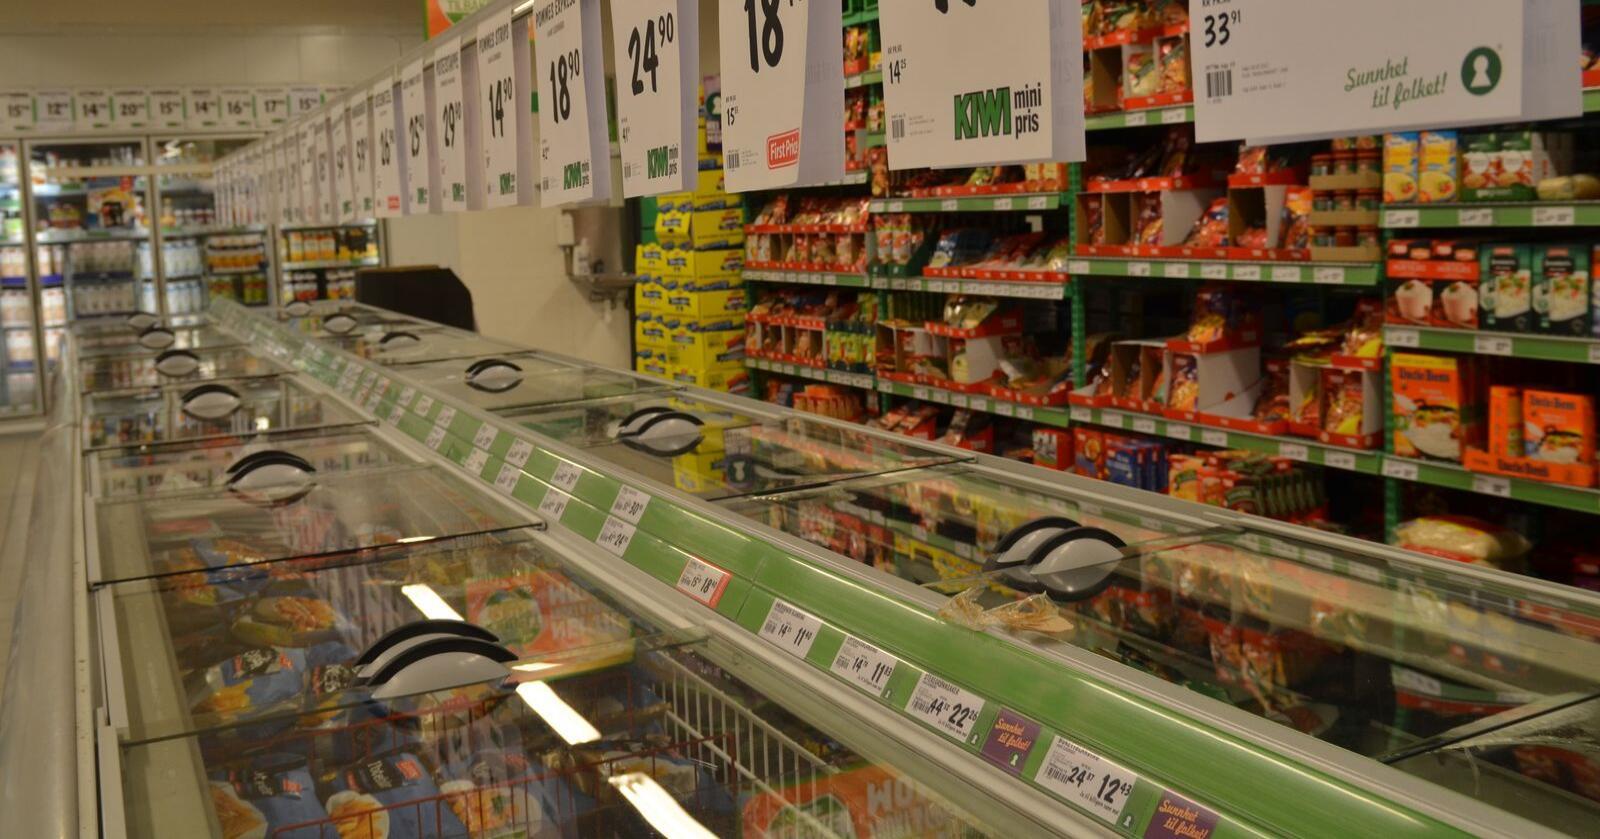 Den samlede omsetningen i dagligvarebransjen var på 45,2 milliarder kroner i første kvartal 2020. (Foto: Karl Erik Berge)